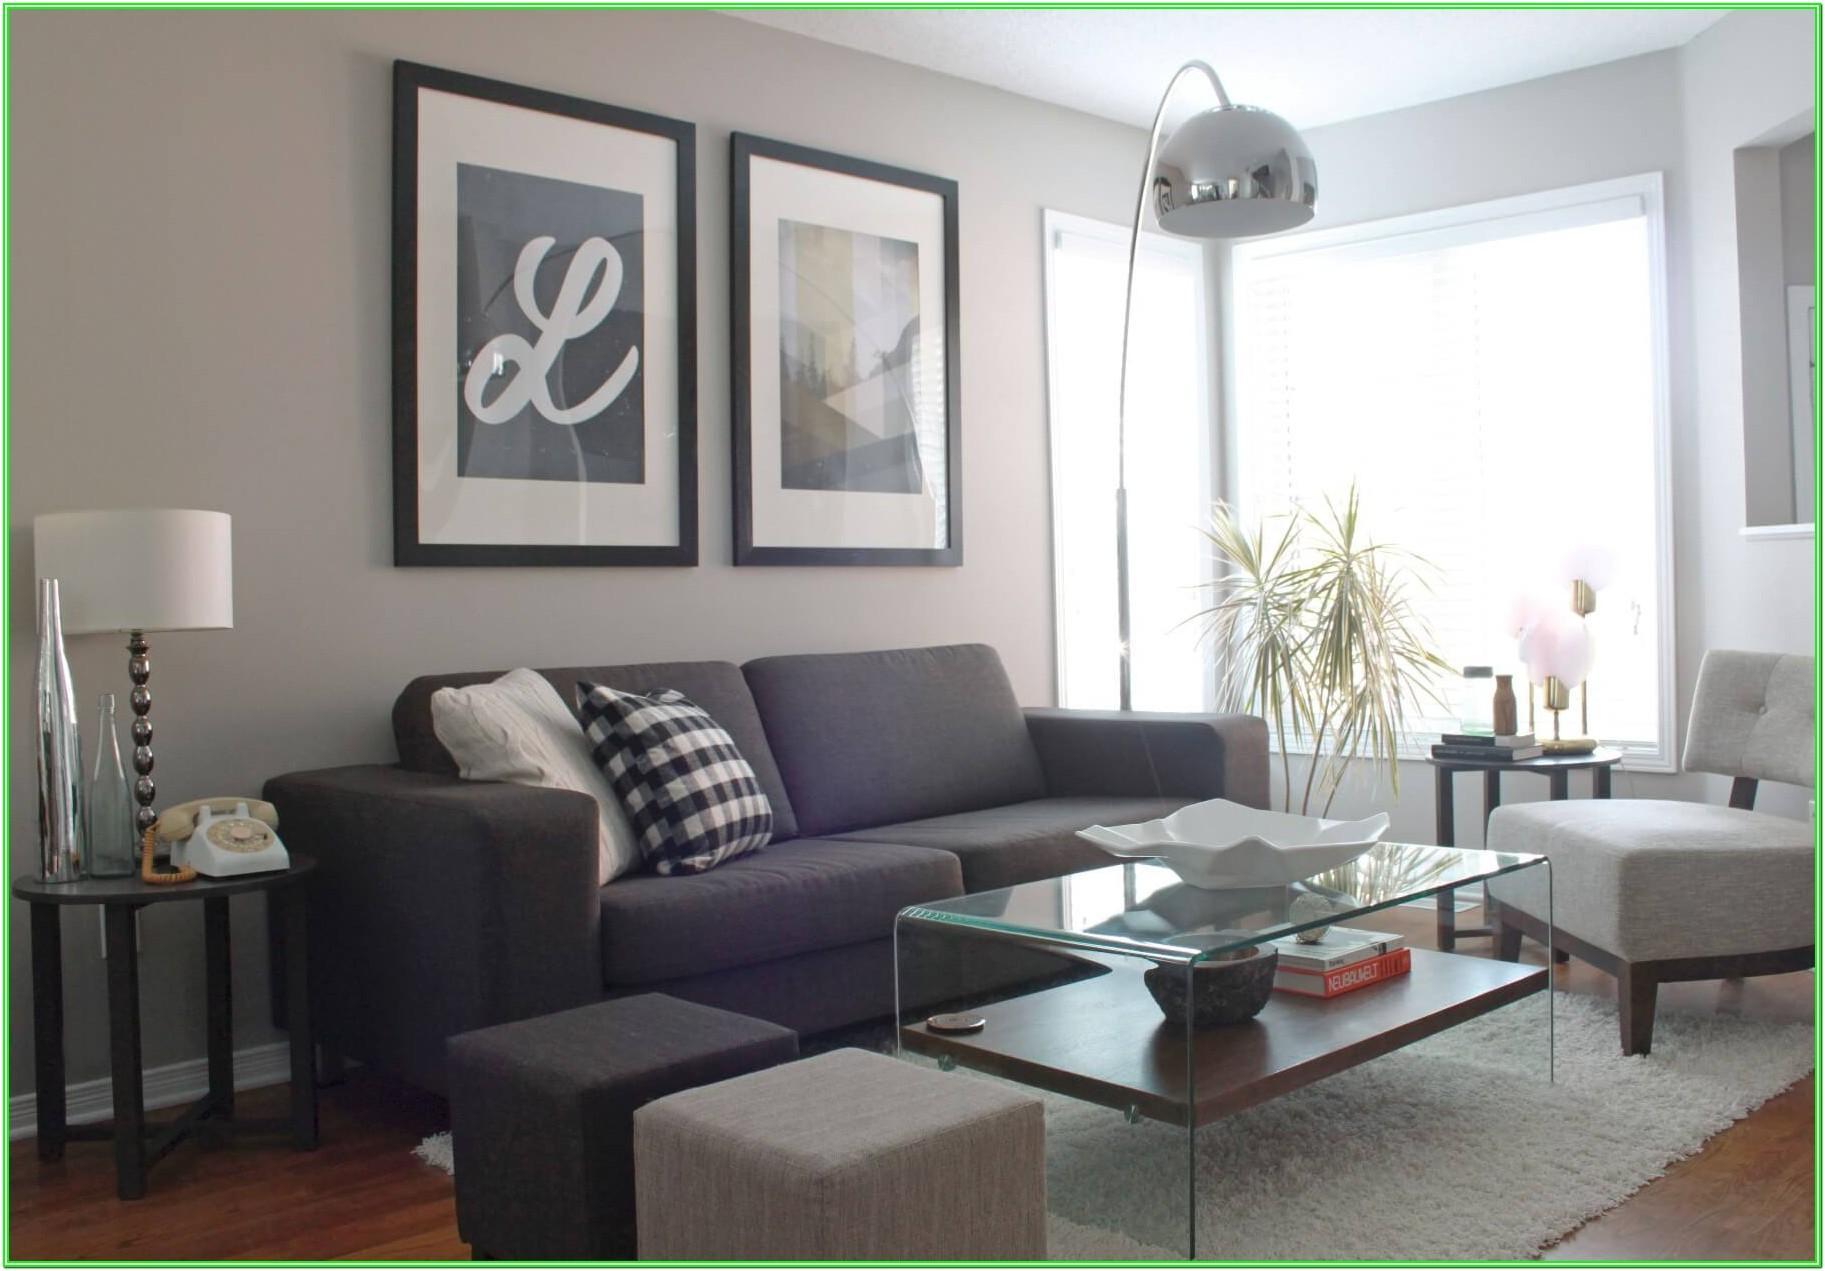 Living Room Design Ideas Colour Schemes